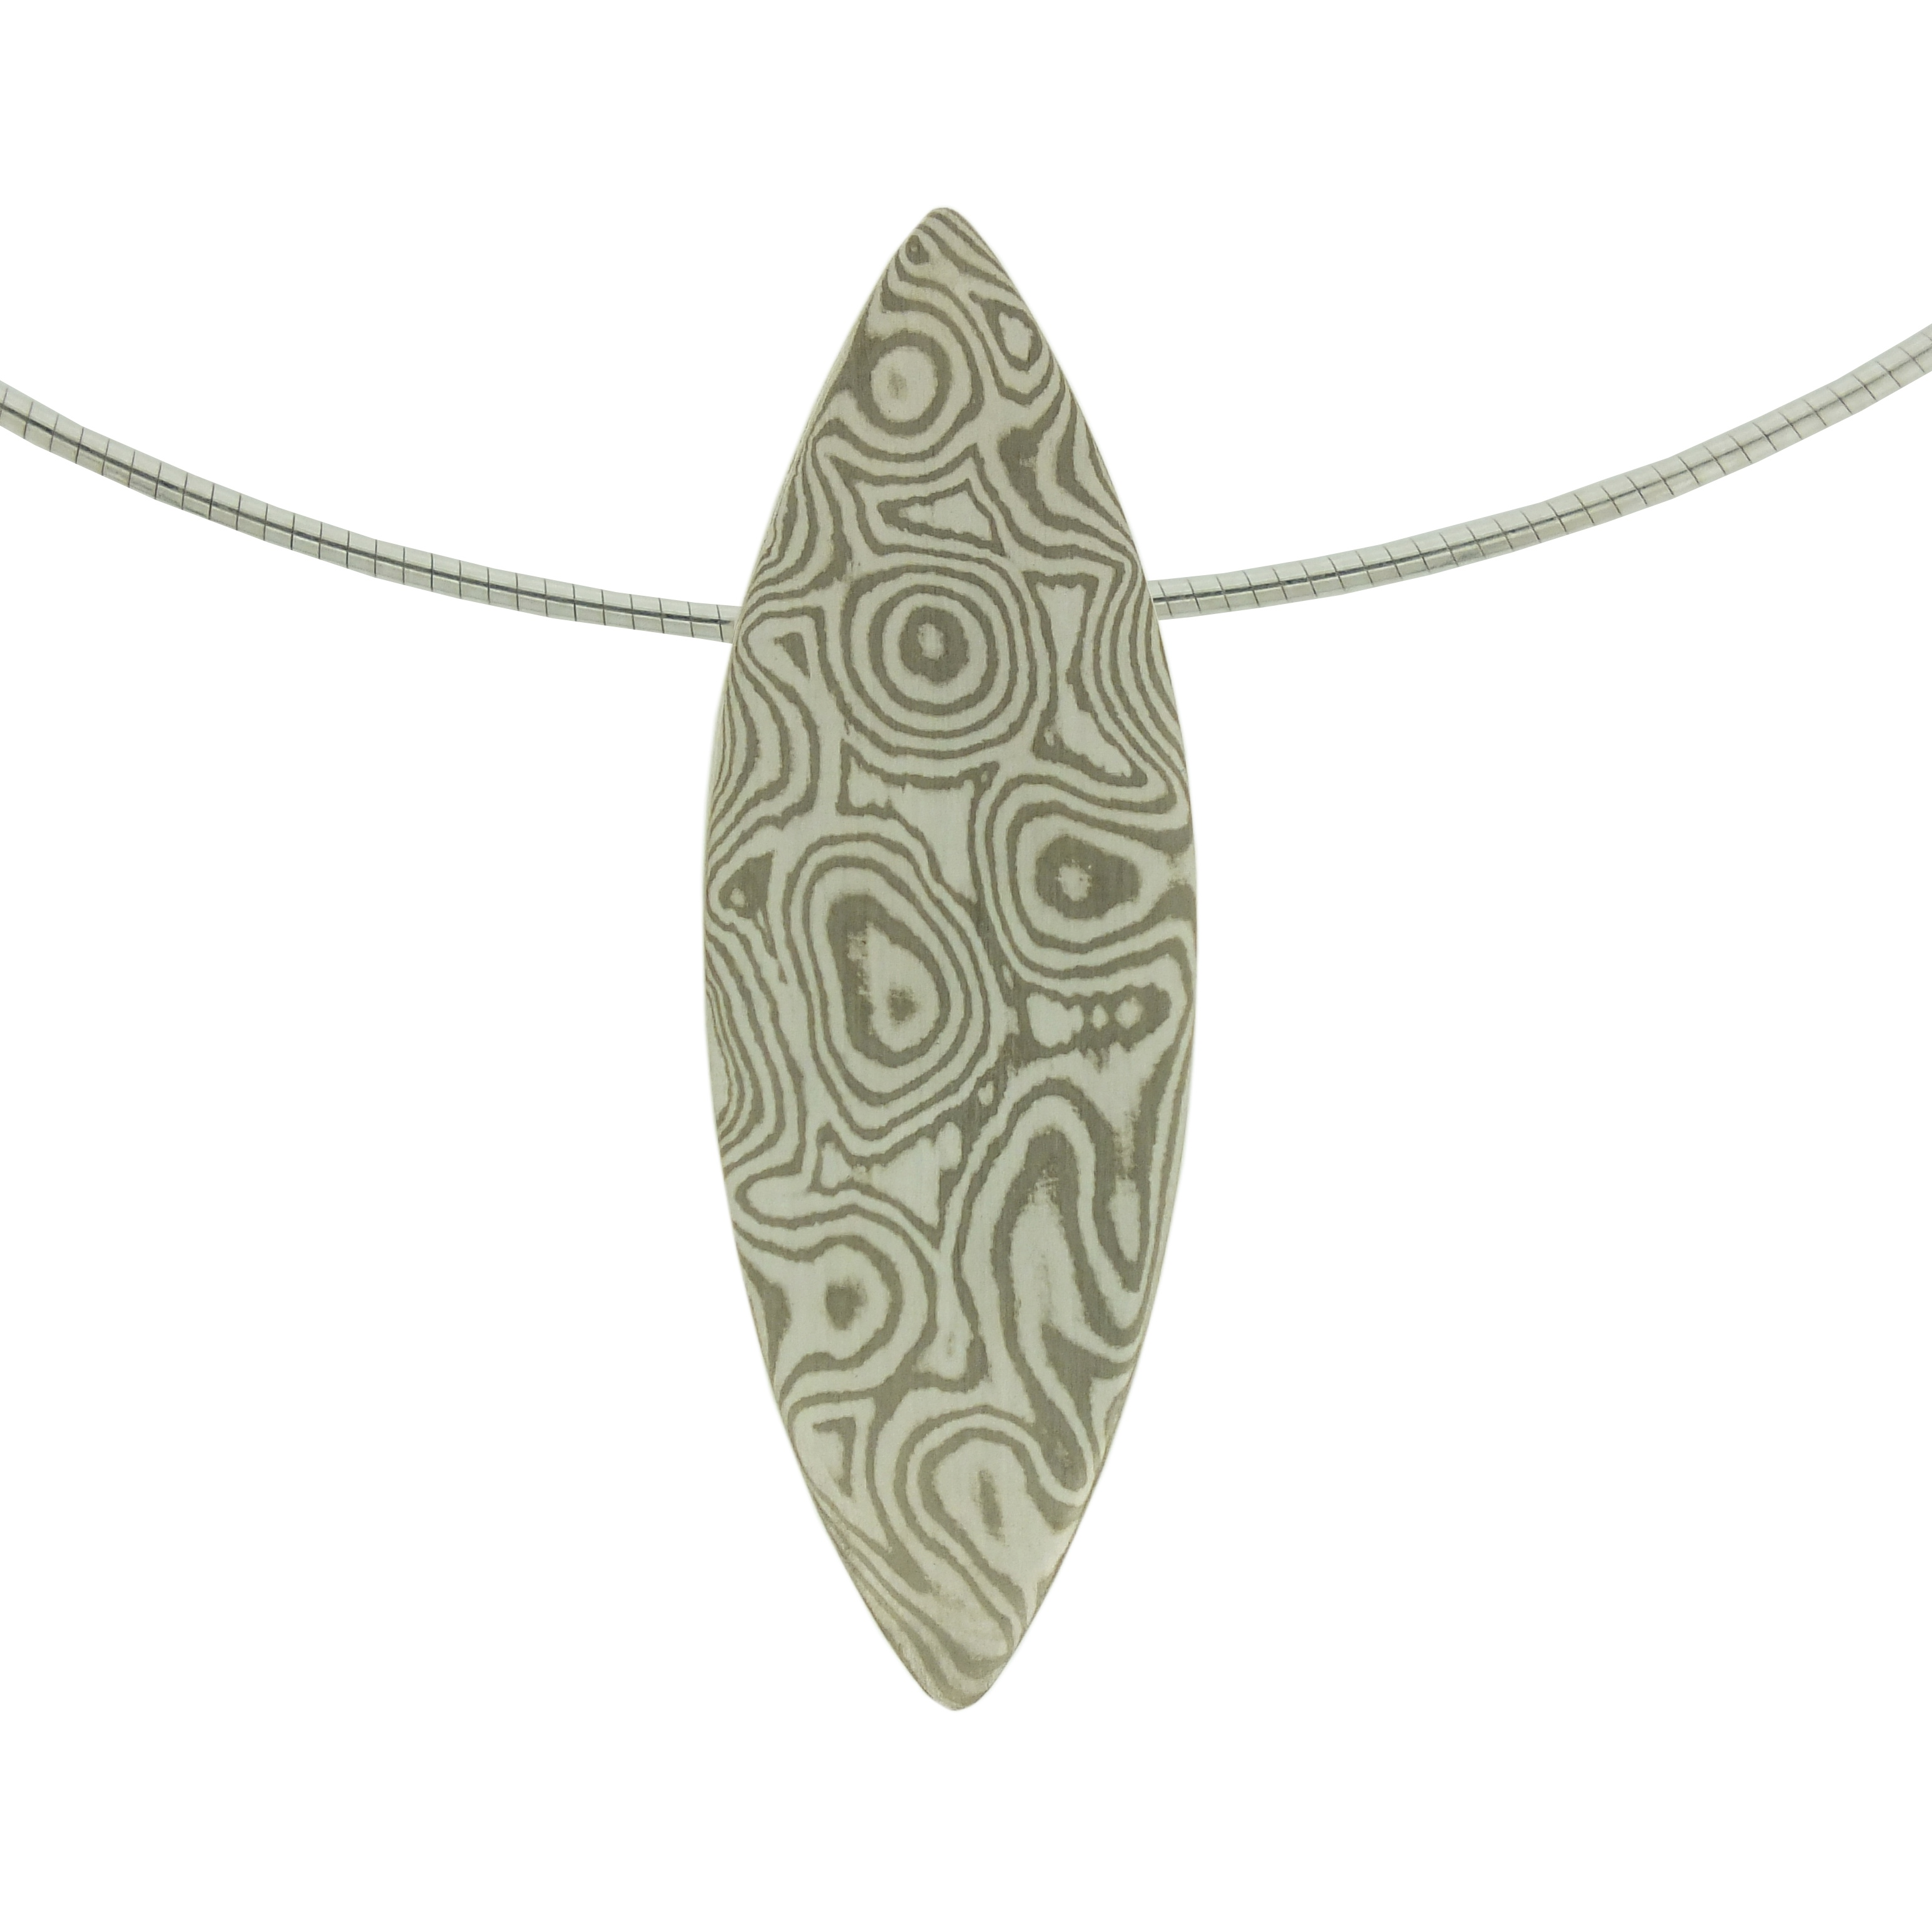 18k white gold and silver mokume gane mandorla pendant